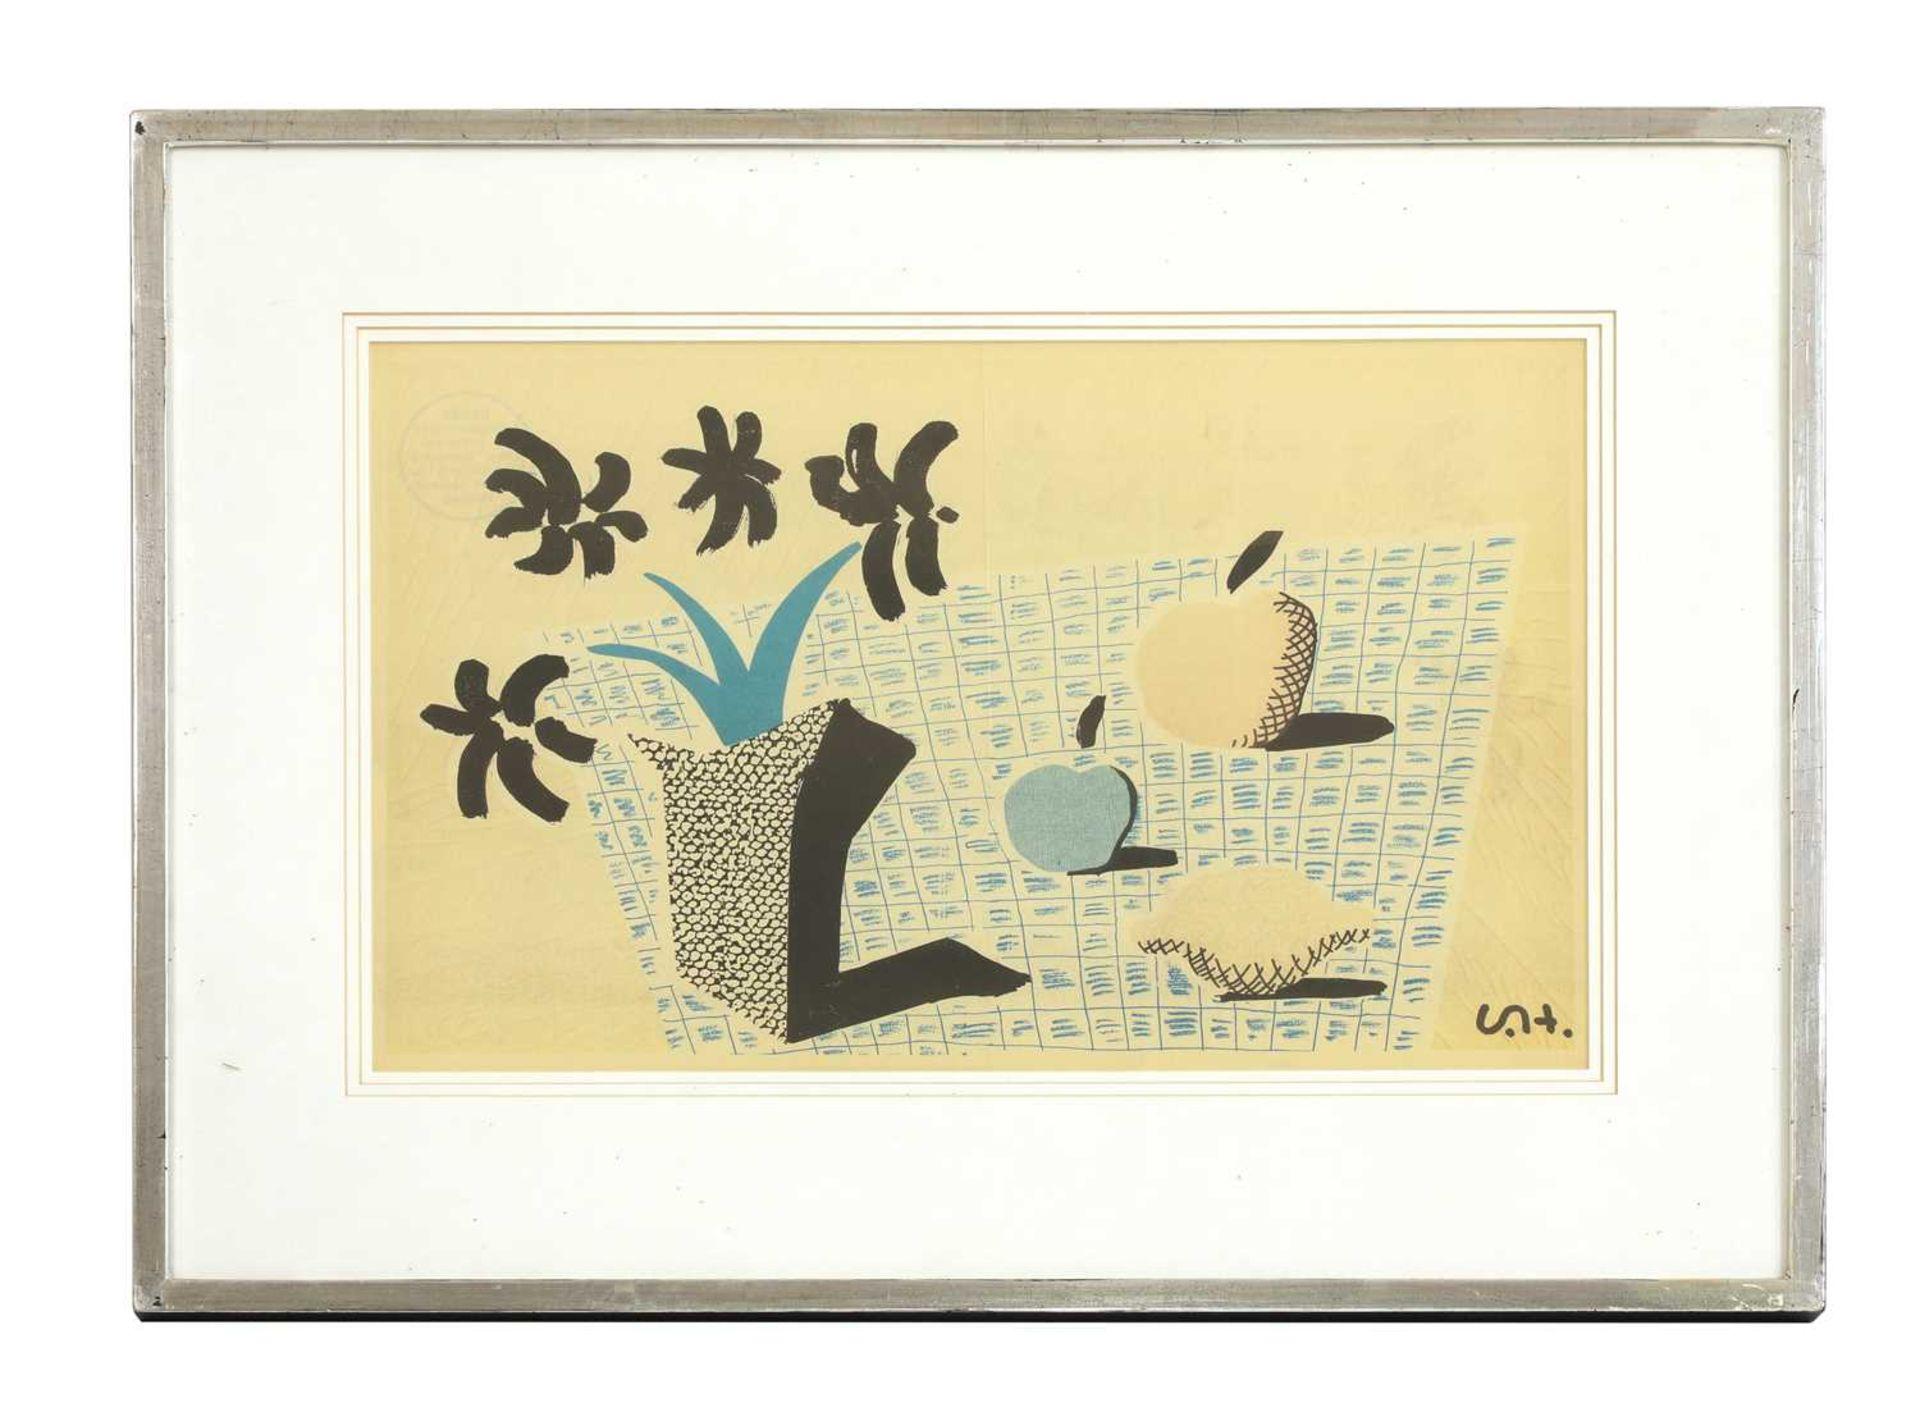 *David Hockney RA (b.1937) - Image 2 of 4